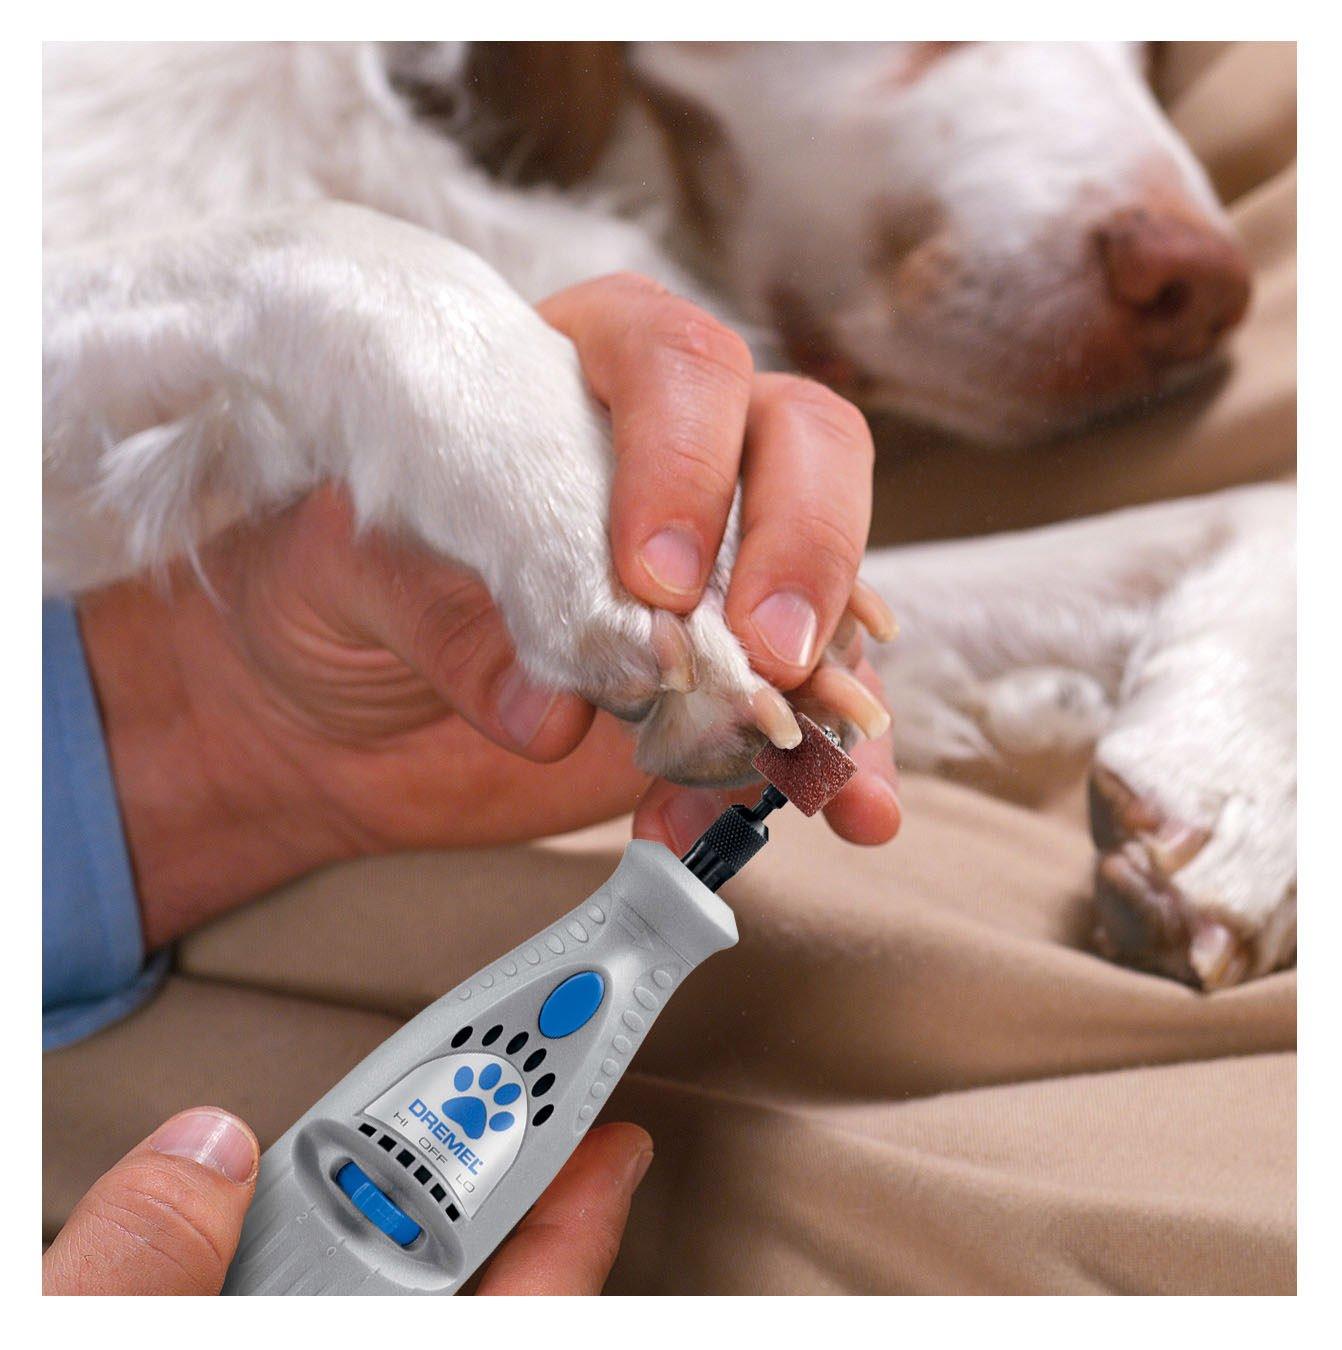 Dremel 7300-PT 4.8-Volt Pet Grooming Kit